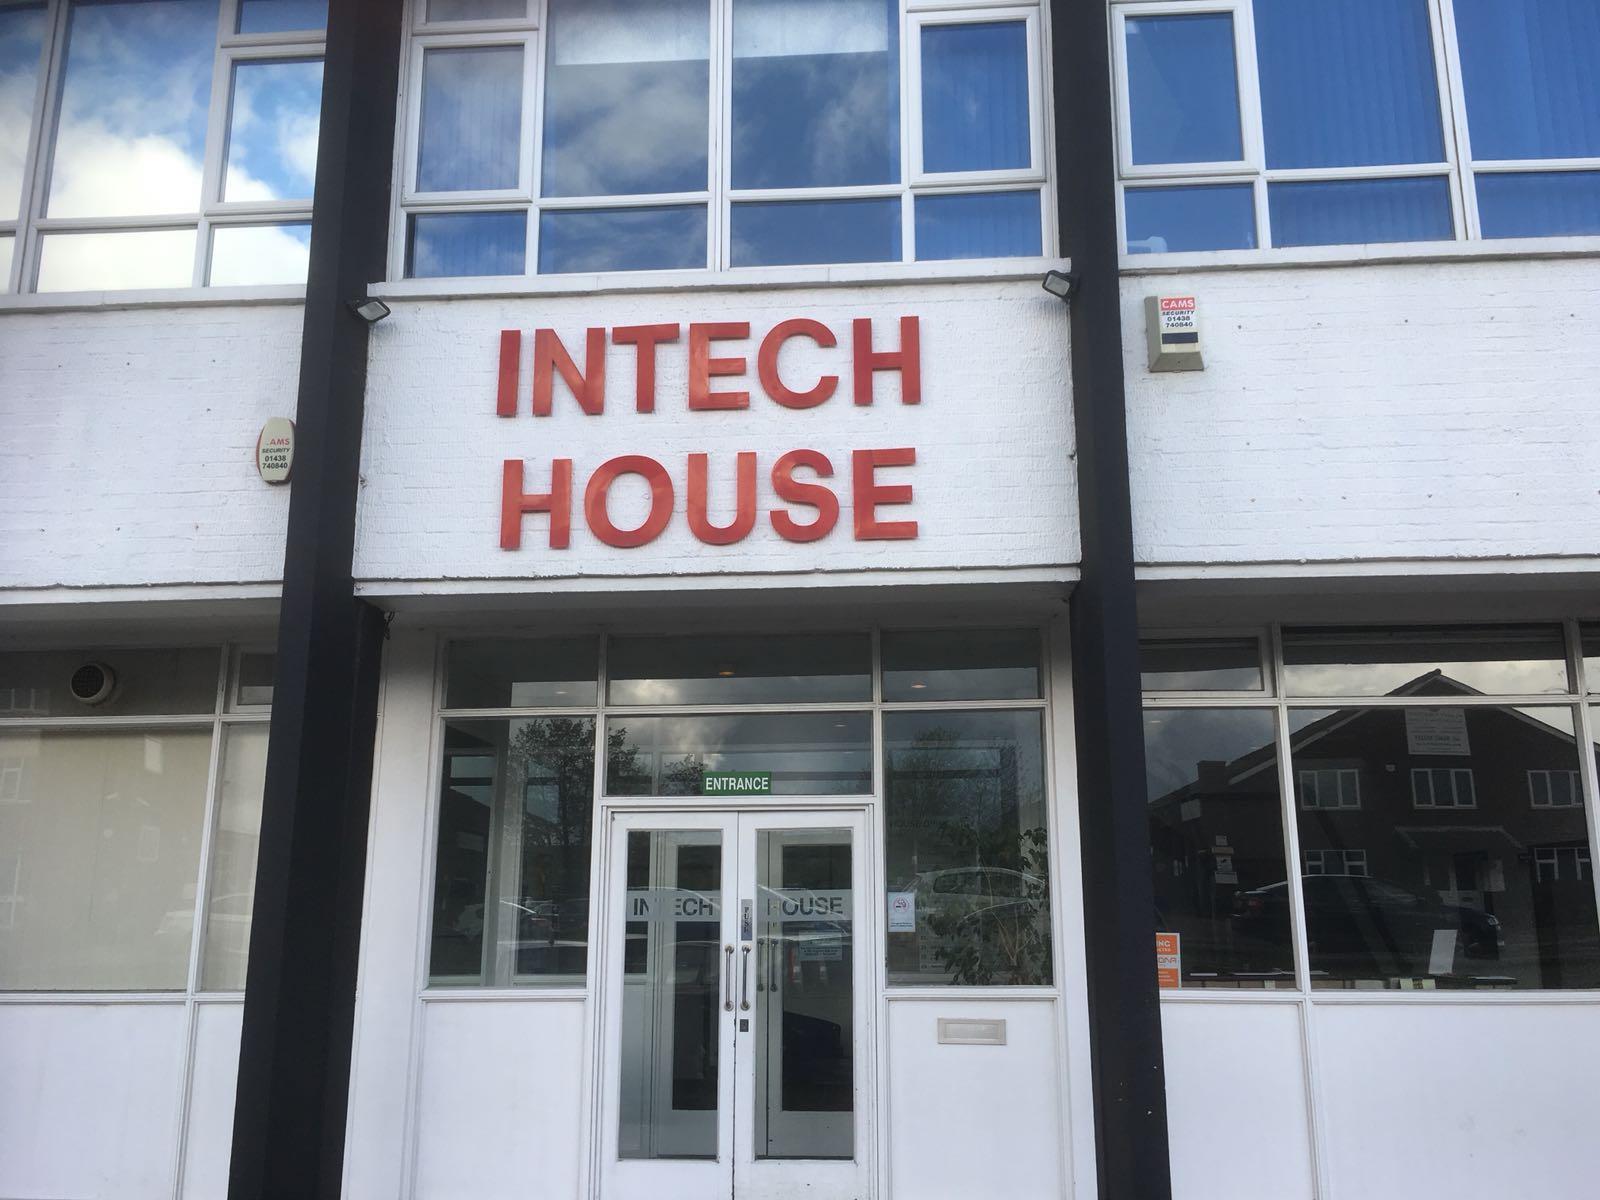 Intech House - Wilbury Way, SG4 - Hitchin - Hertfordshire